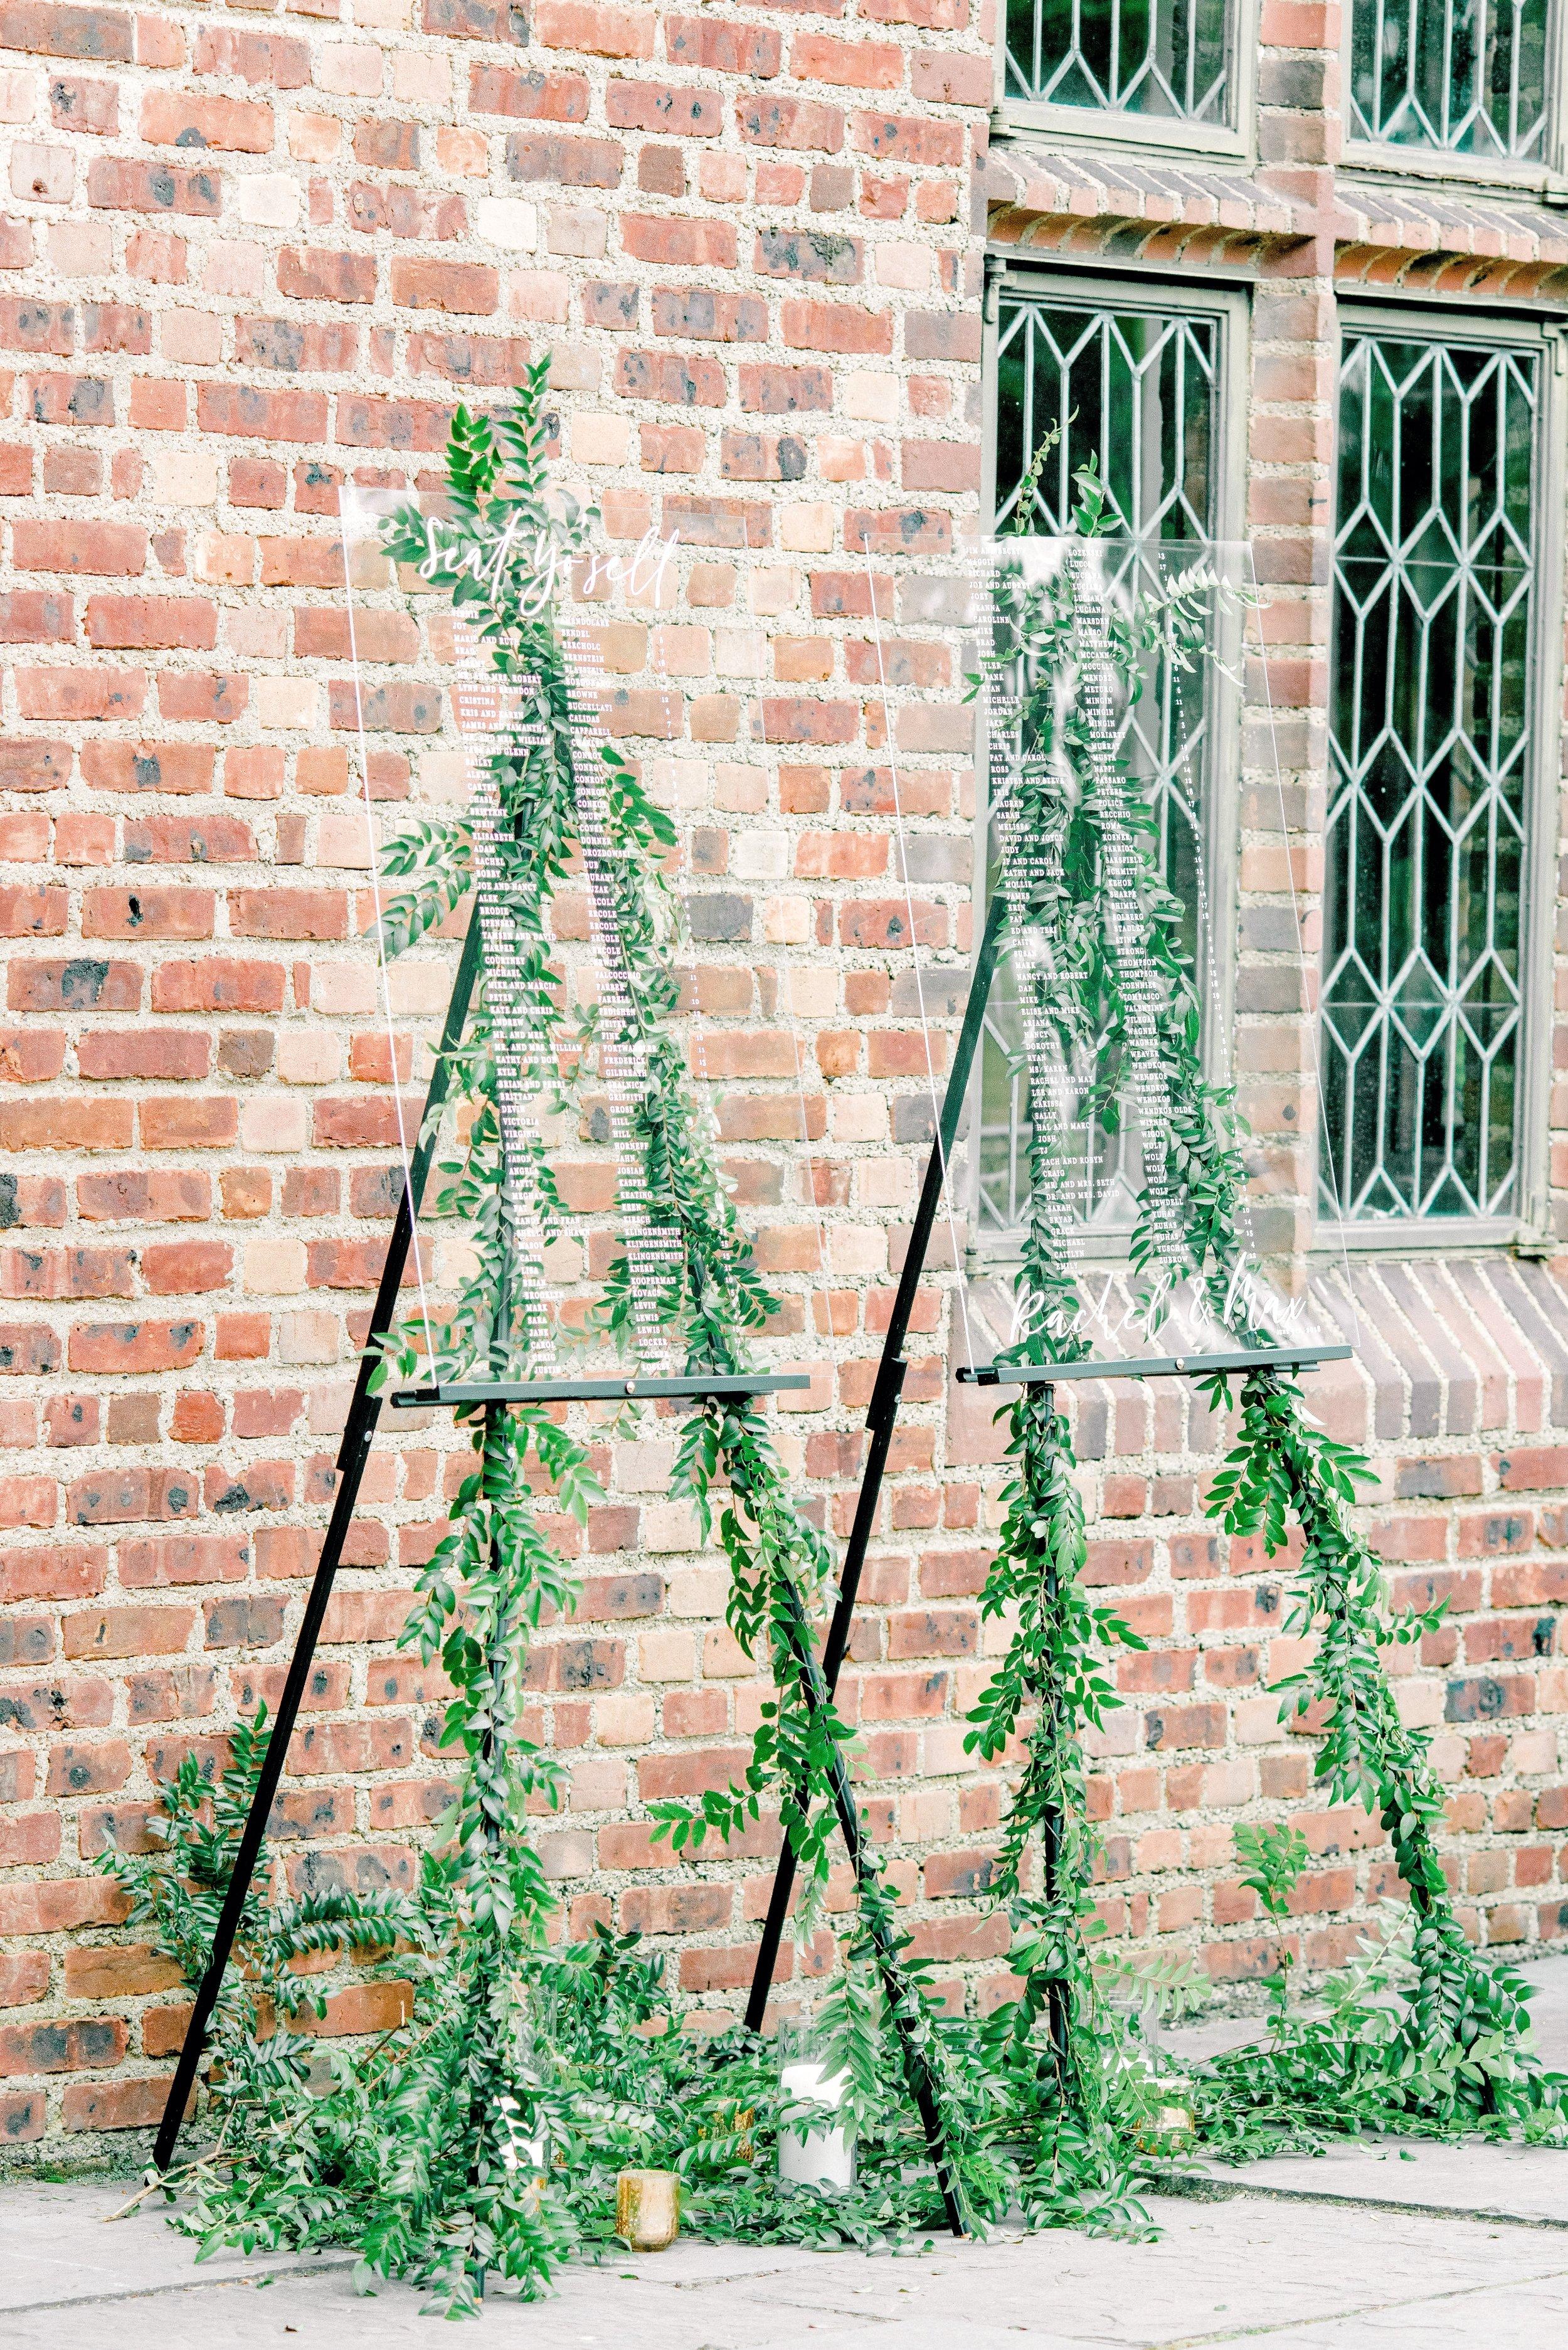 Aldie Mansion Wedding, Escort Cards, Seating Chart, Greenery Wedding, Garden Wedding, Philly Wedding, NJ Florist, Wedding Inspo, House of Catherine, Rachel Pearlman Photography